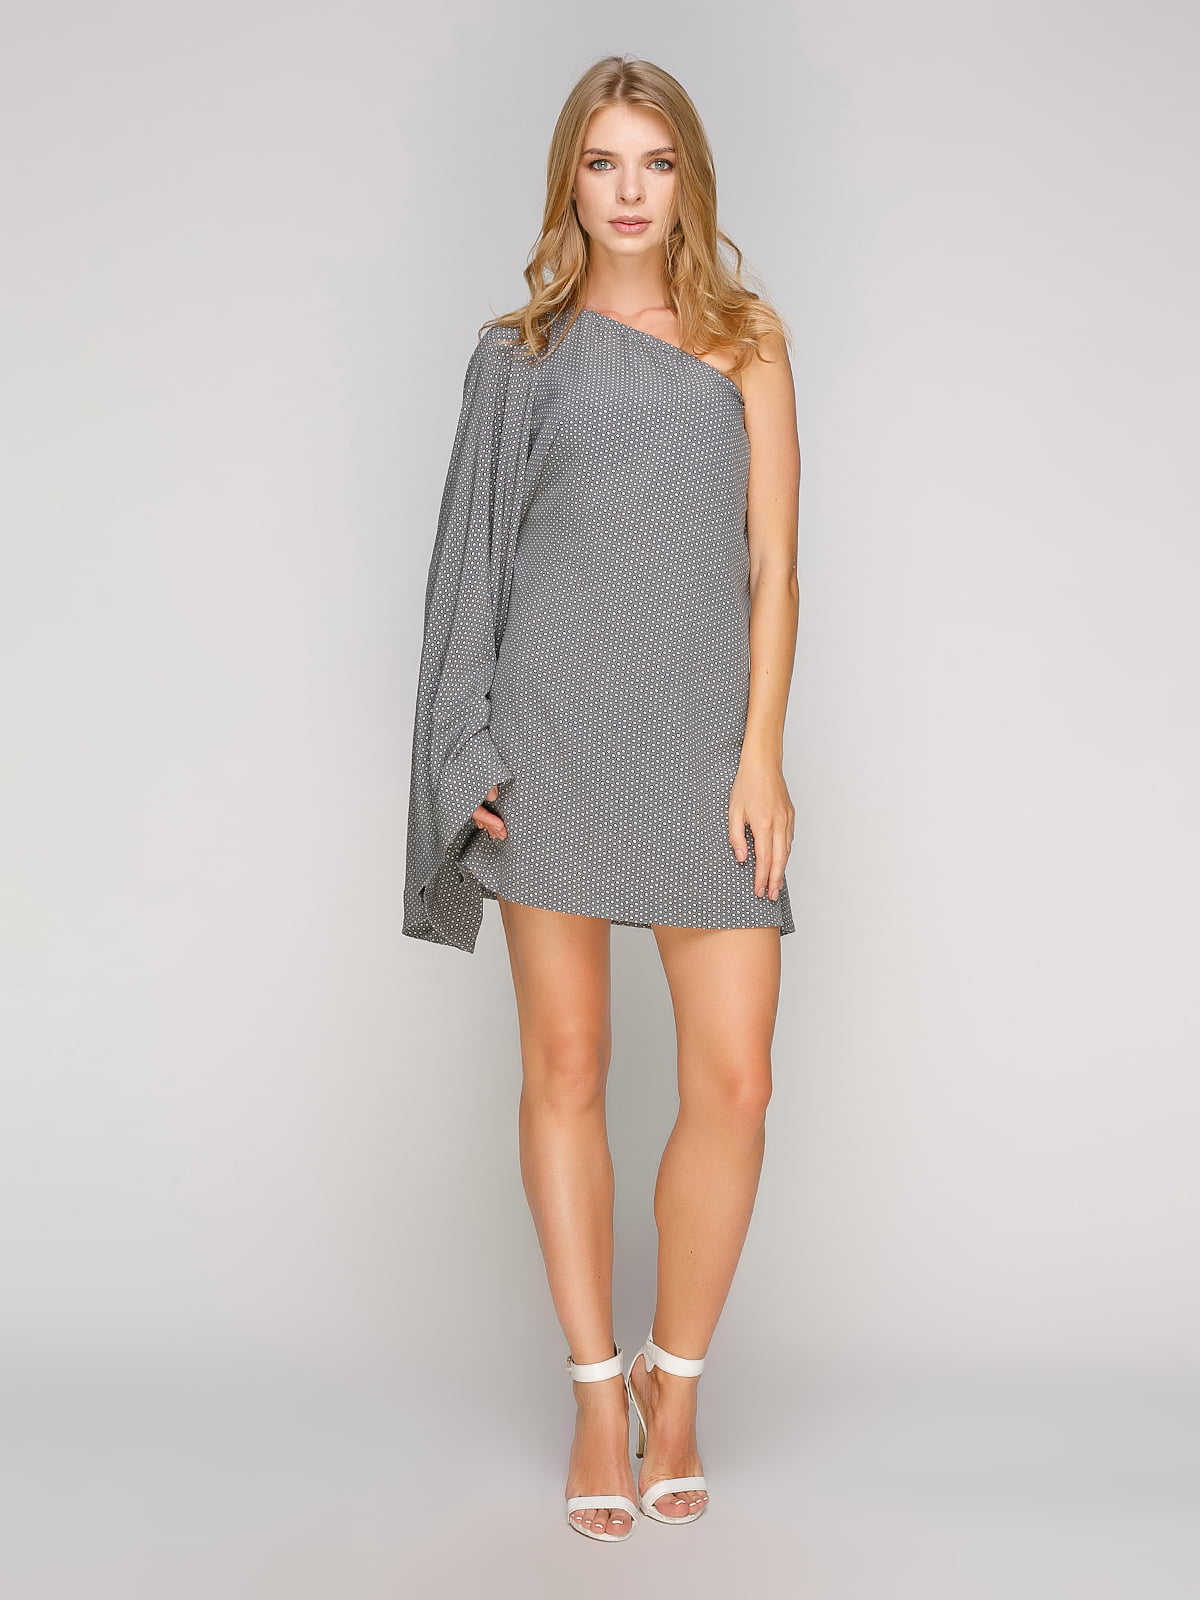 Сукня сіра в принт | 5102090